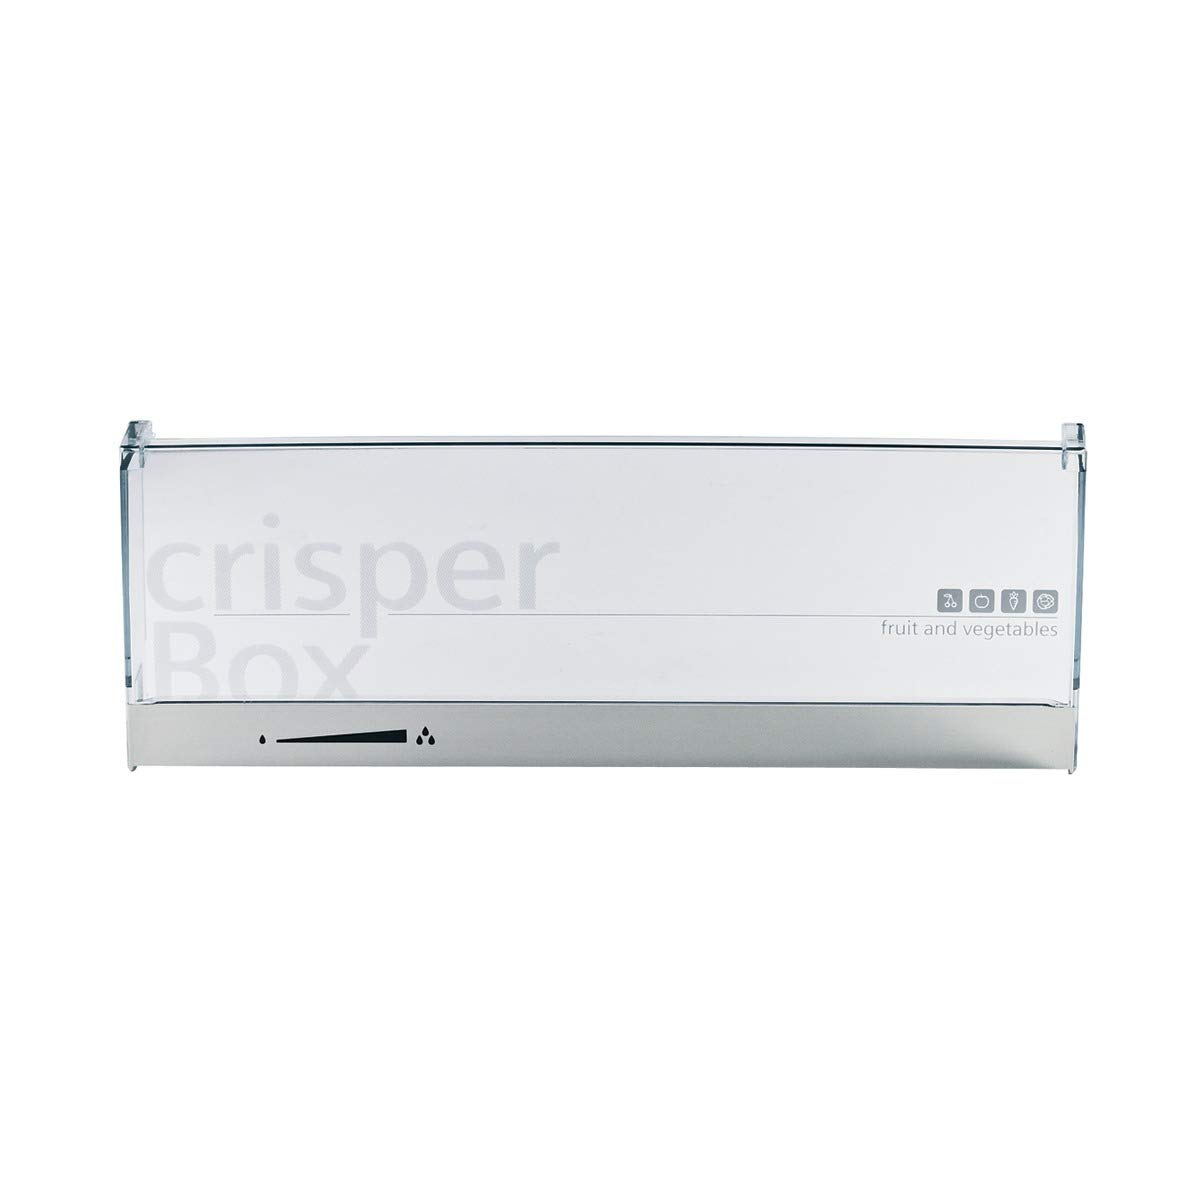 Bosch Siemens Apertura 12000349 para Crisper cajón Frigorífico ...